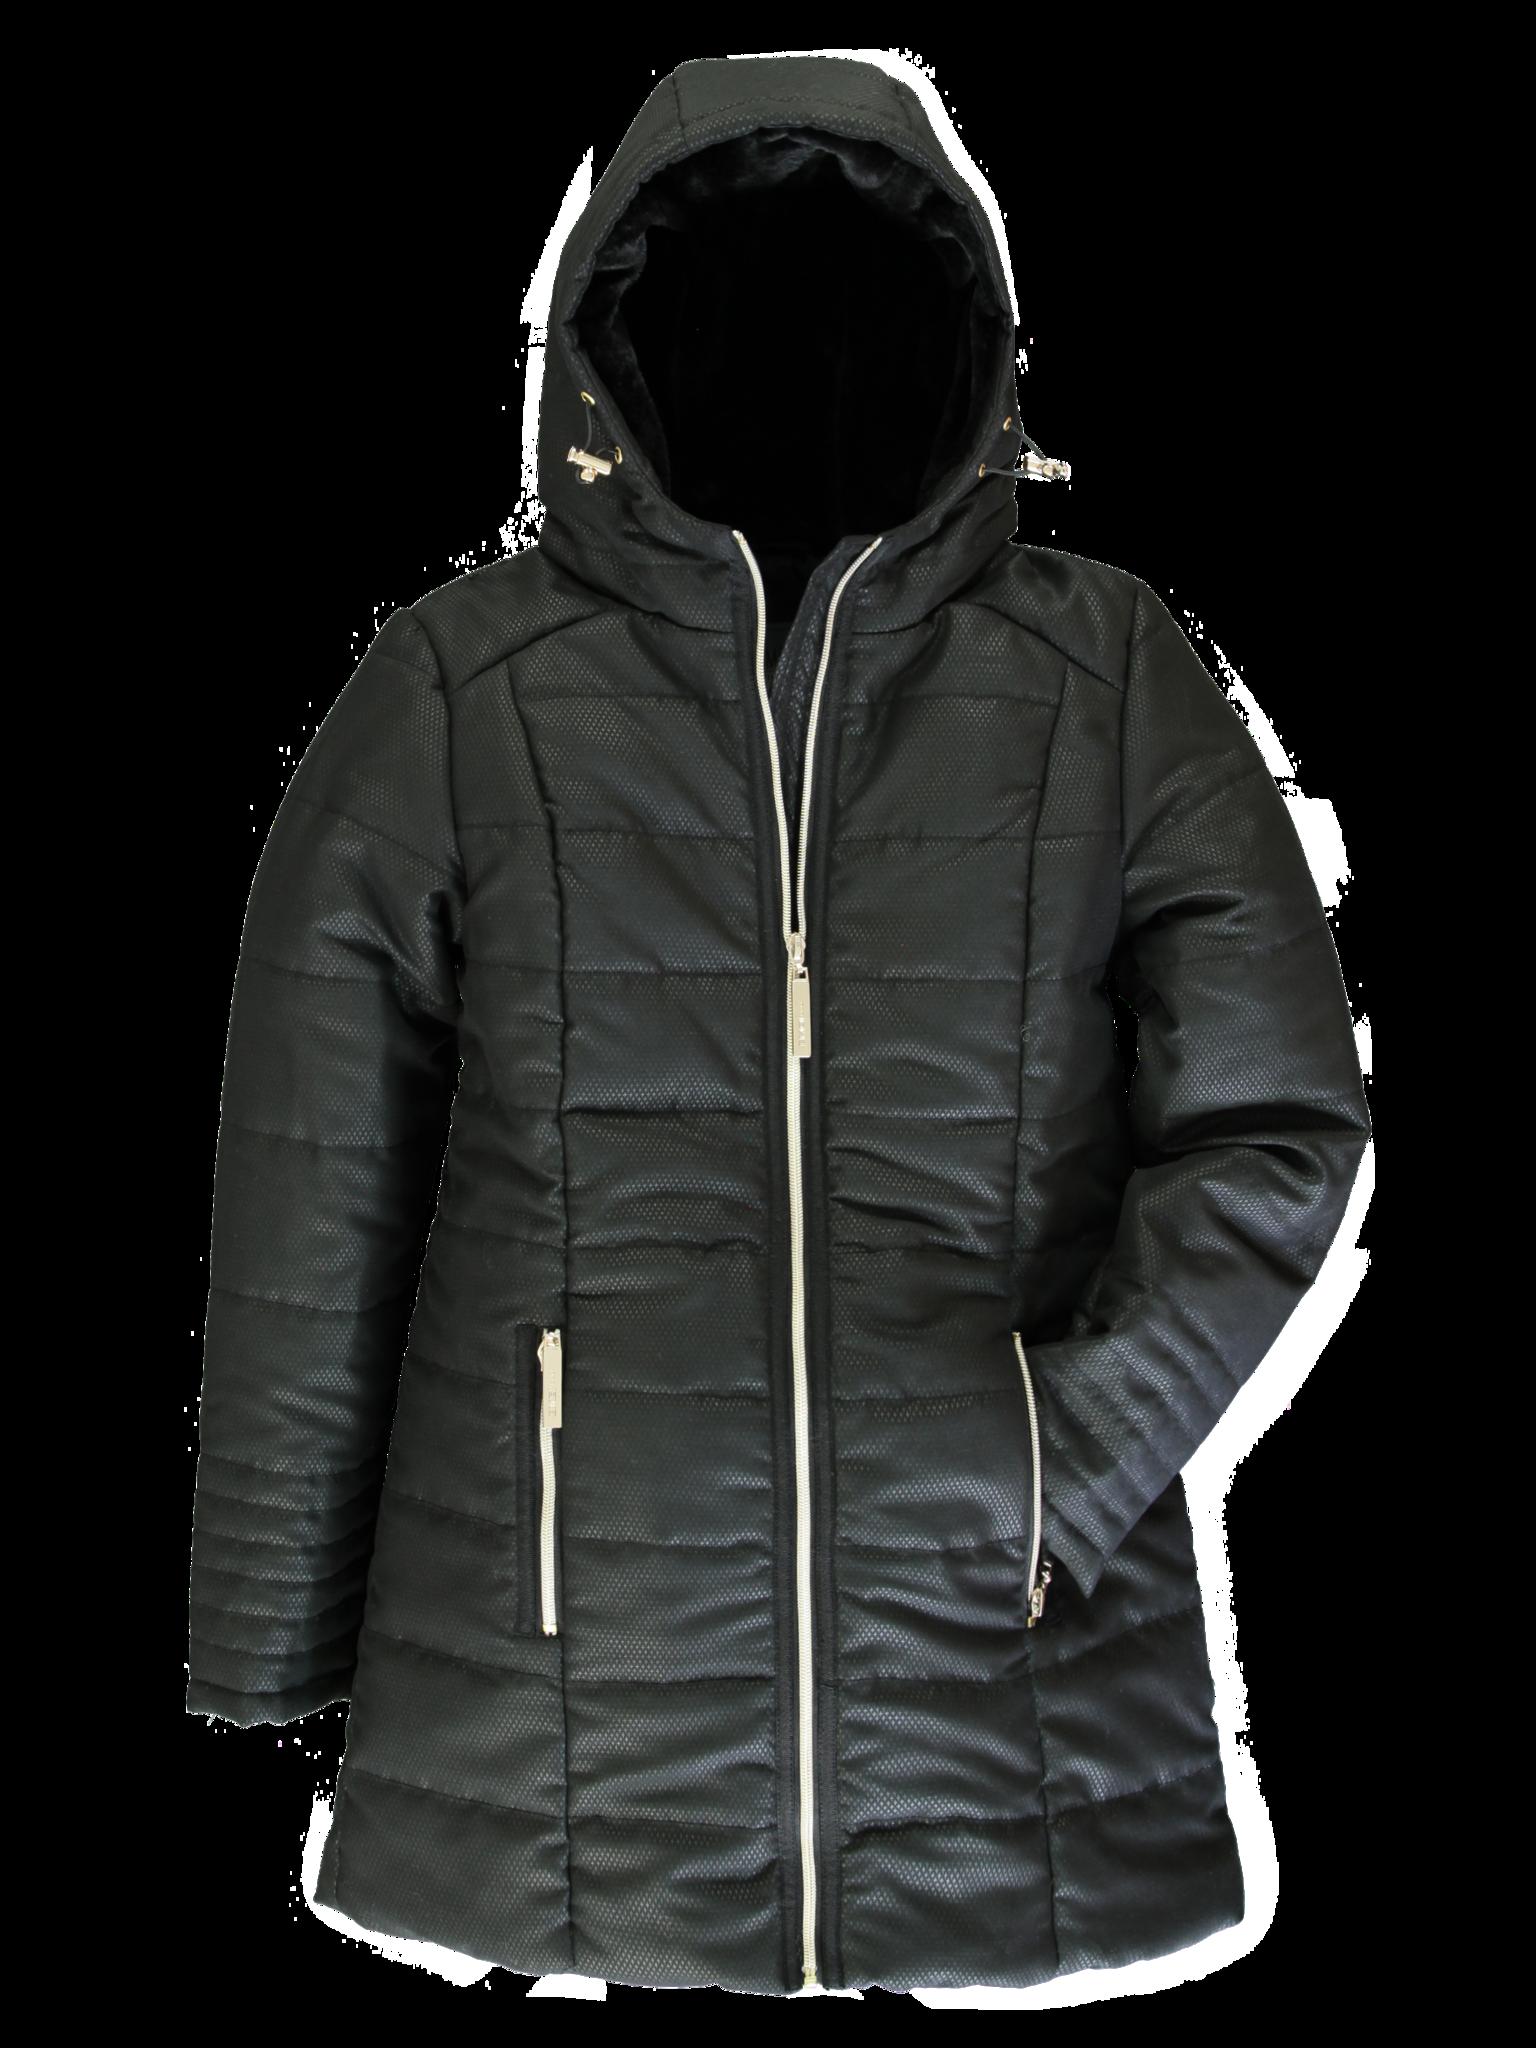 All Brands   Winterproducts Ladies   Jacket   12 pcs/box